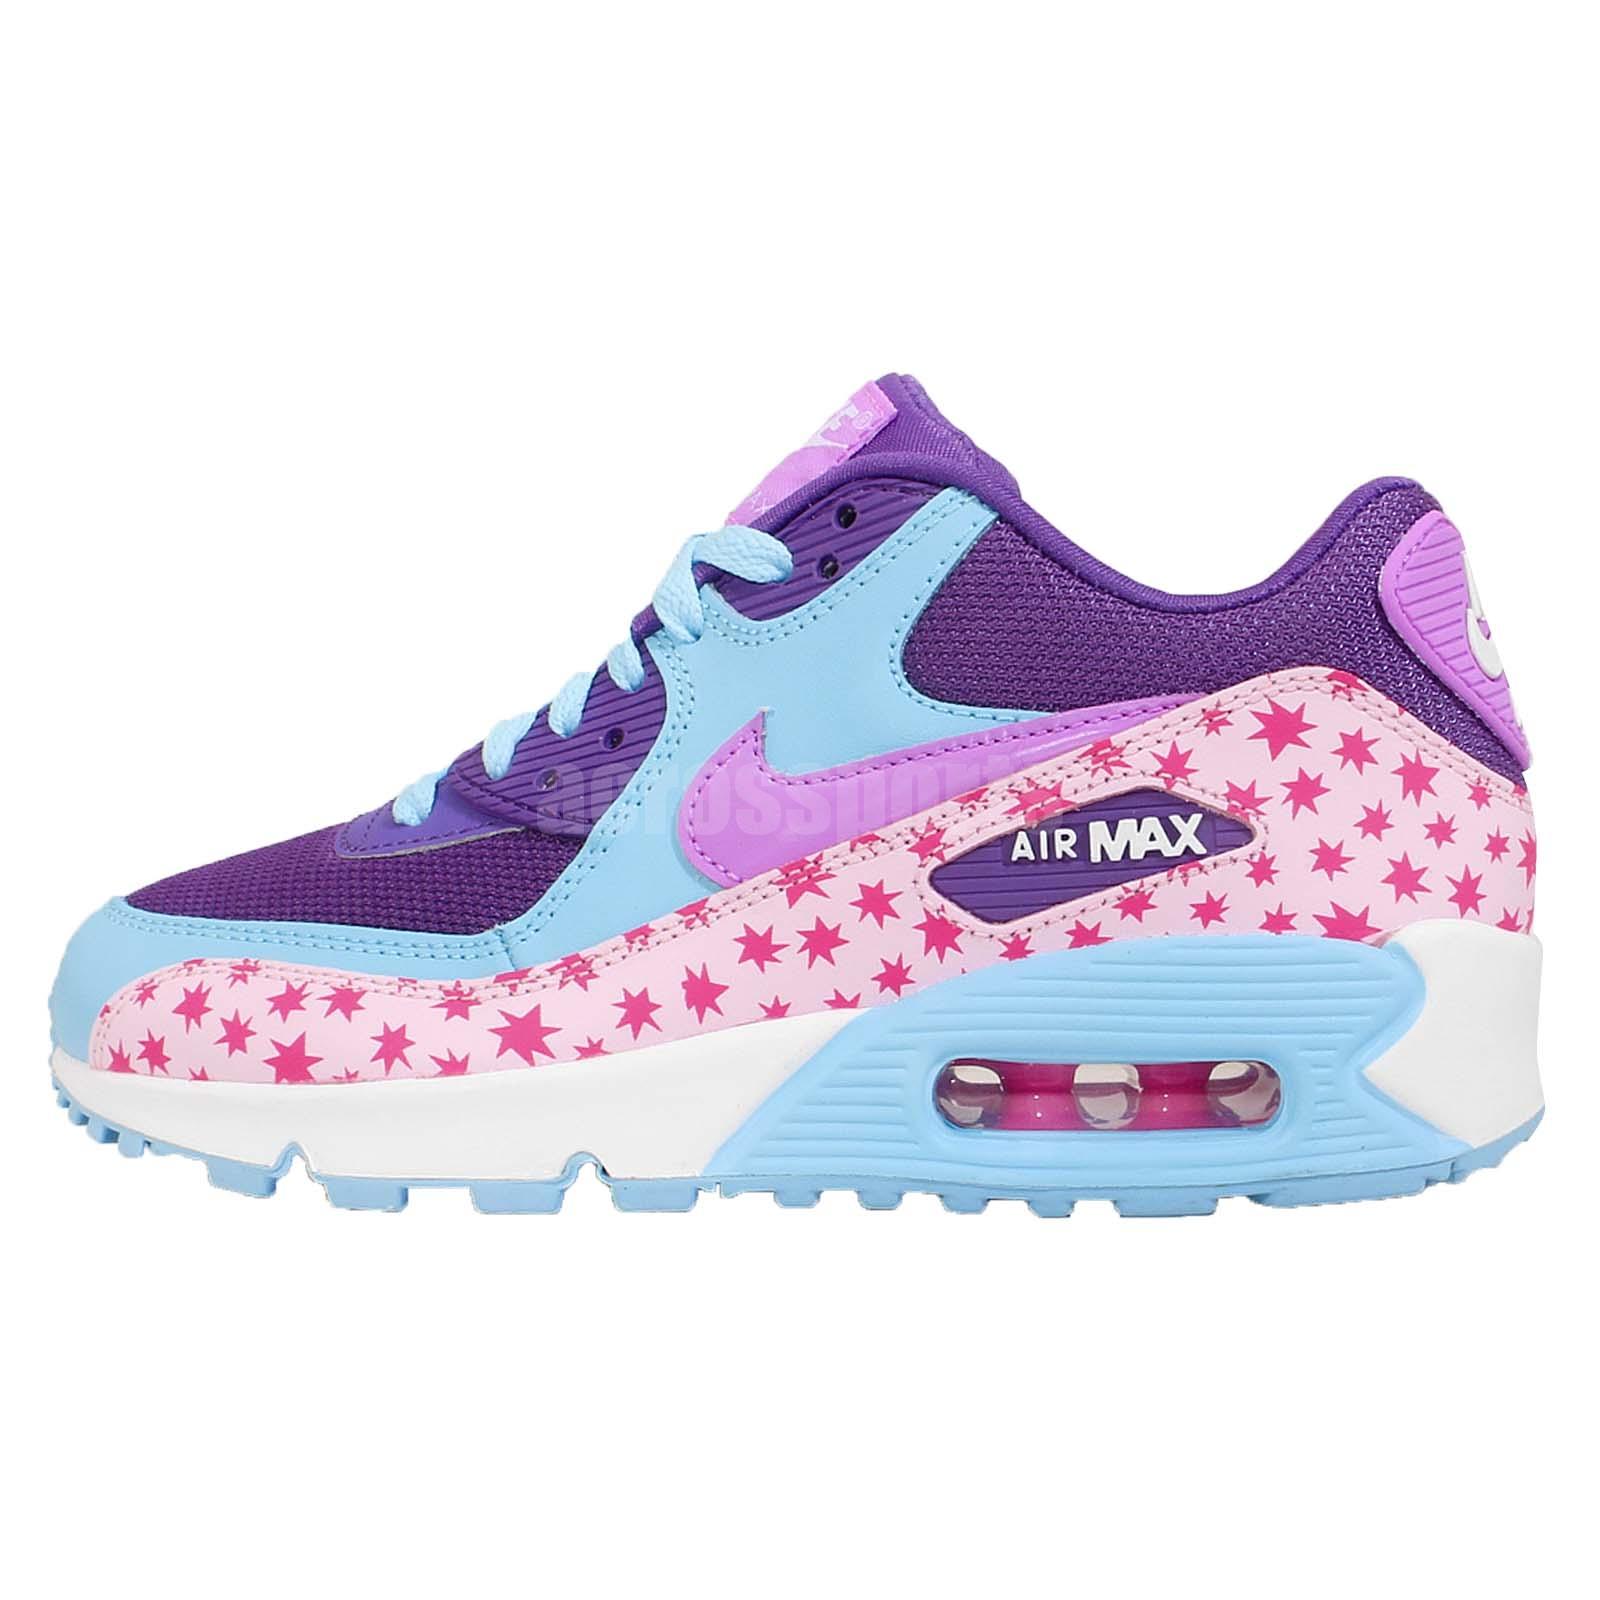 nike air max 90 prem mesh gs star purple pink blue girls. Black Bedroom Furniture Sets. Home Design Ideas